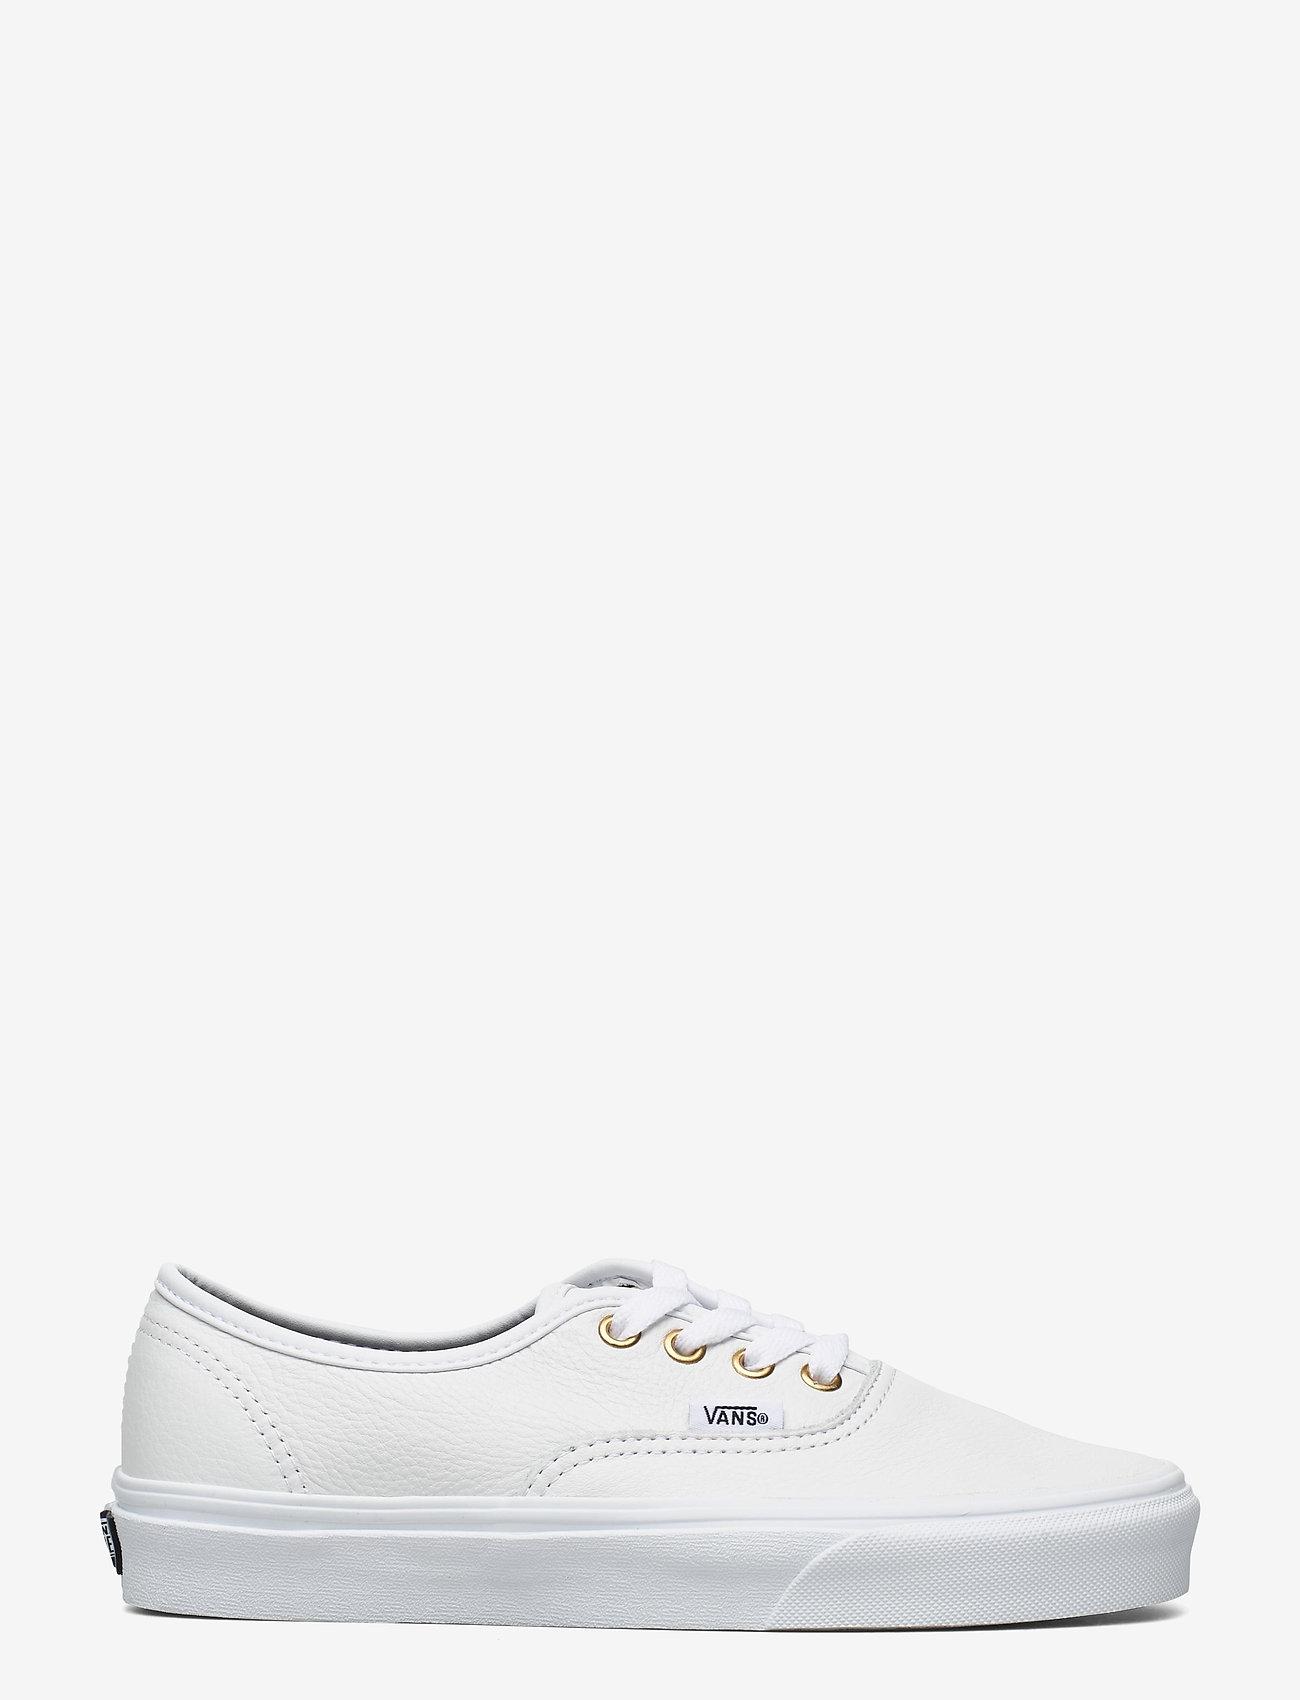 VANS - UA Authentic - laag sneakers - (leather) truewht/truewht - 1